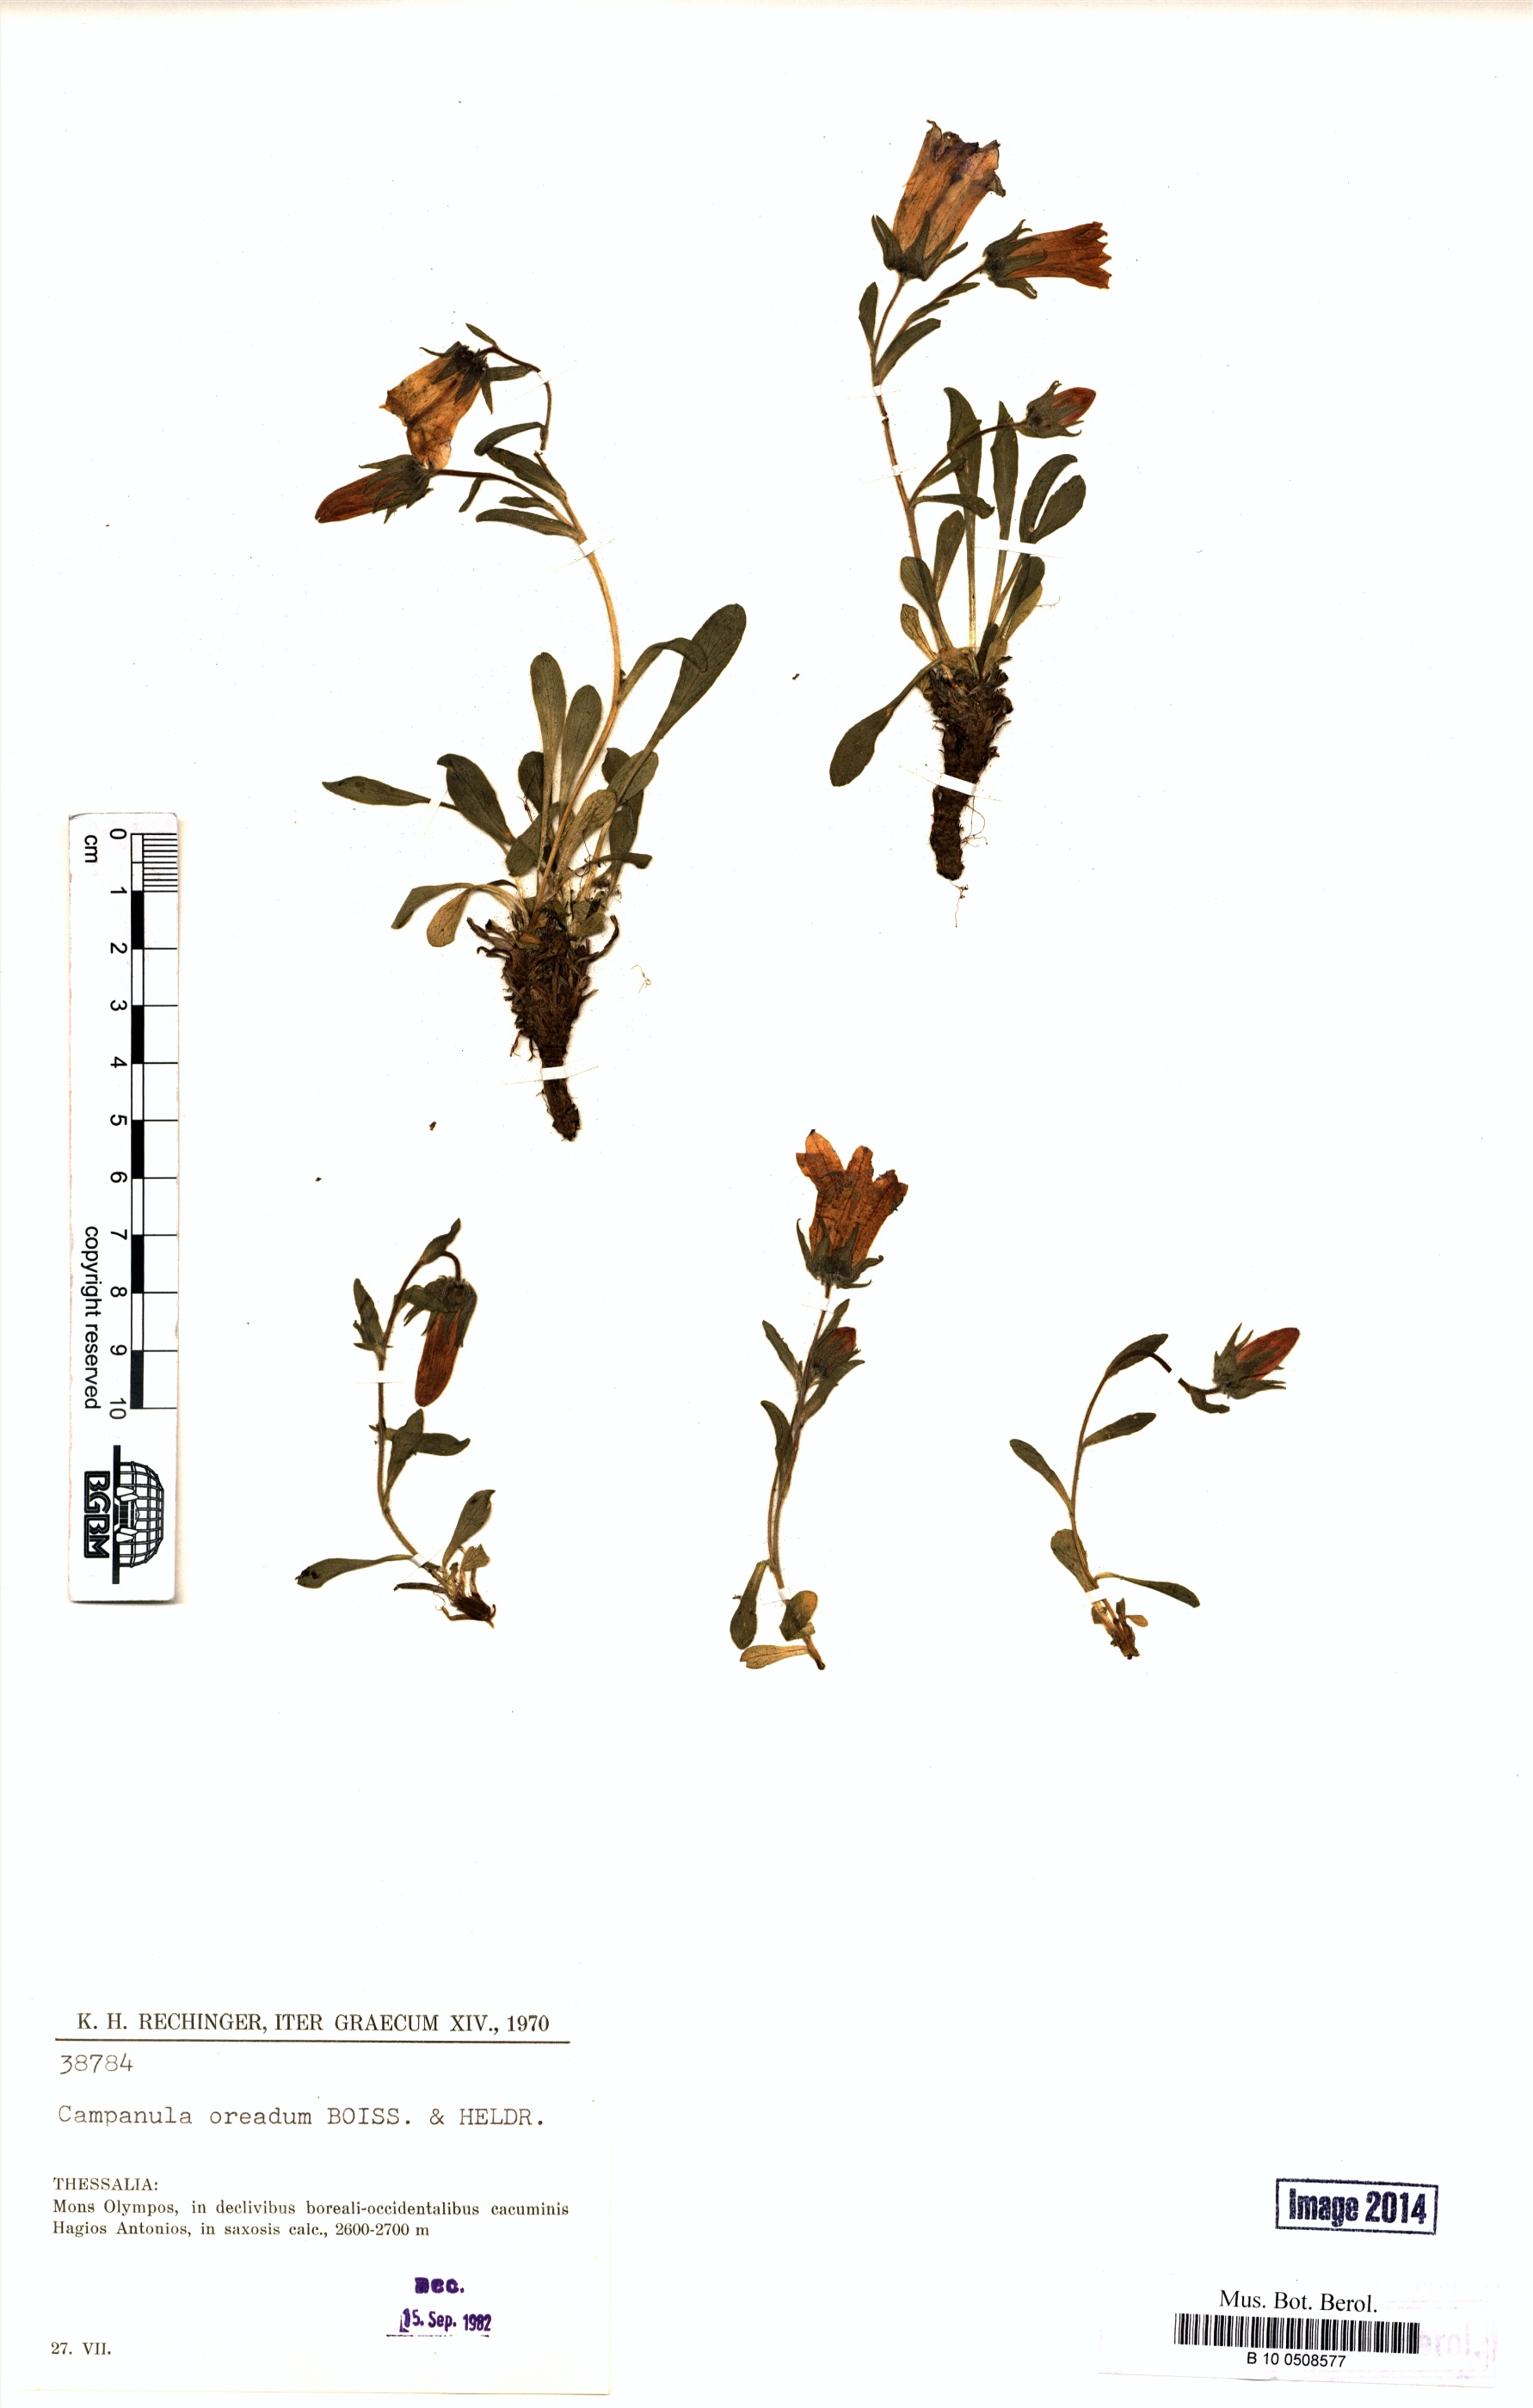 http://ww2.bgbm.org/herbarium/images/B/10/05/08/57/B_10_0508577.jpg